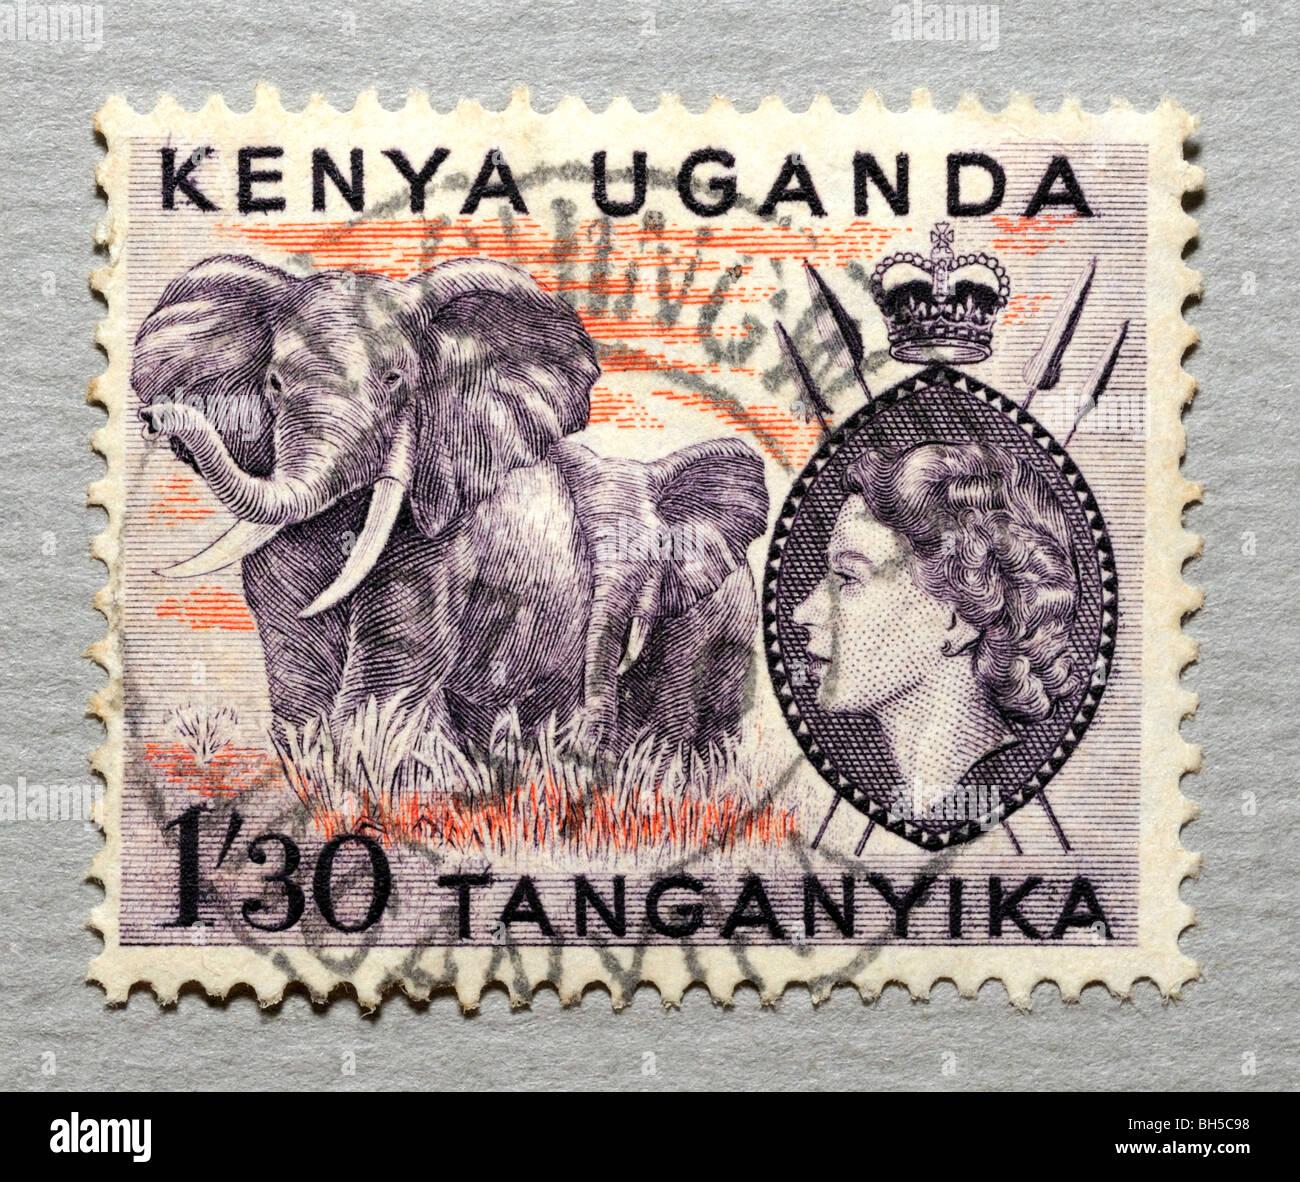 Kenya Postage Stamp. Stock Photo